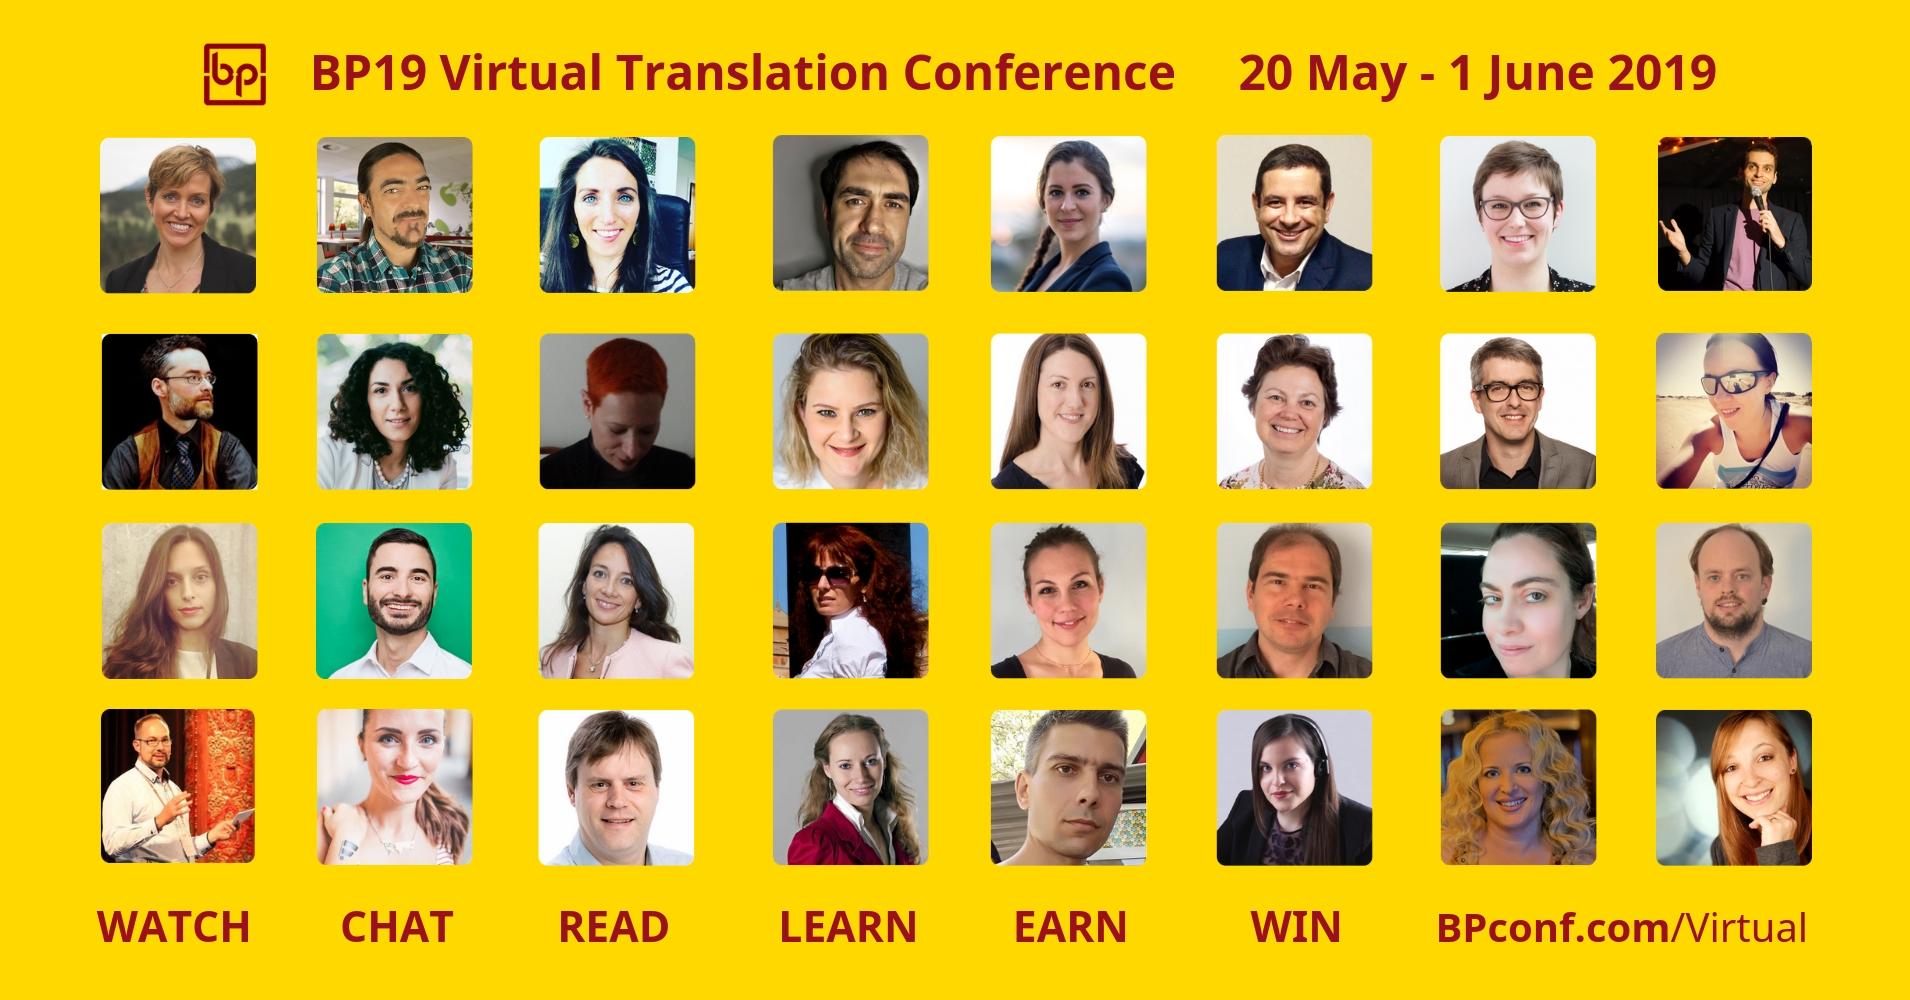 BP19 Virtual TRanslation Conference